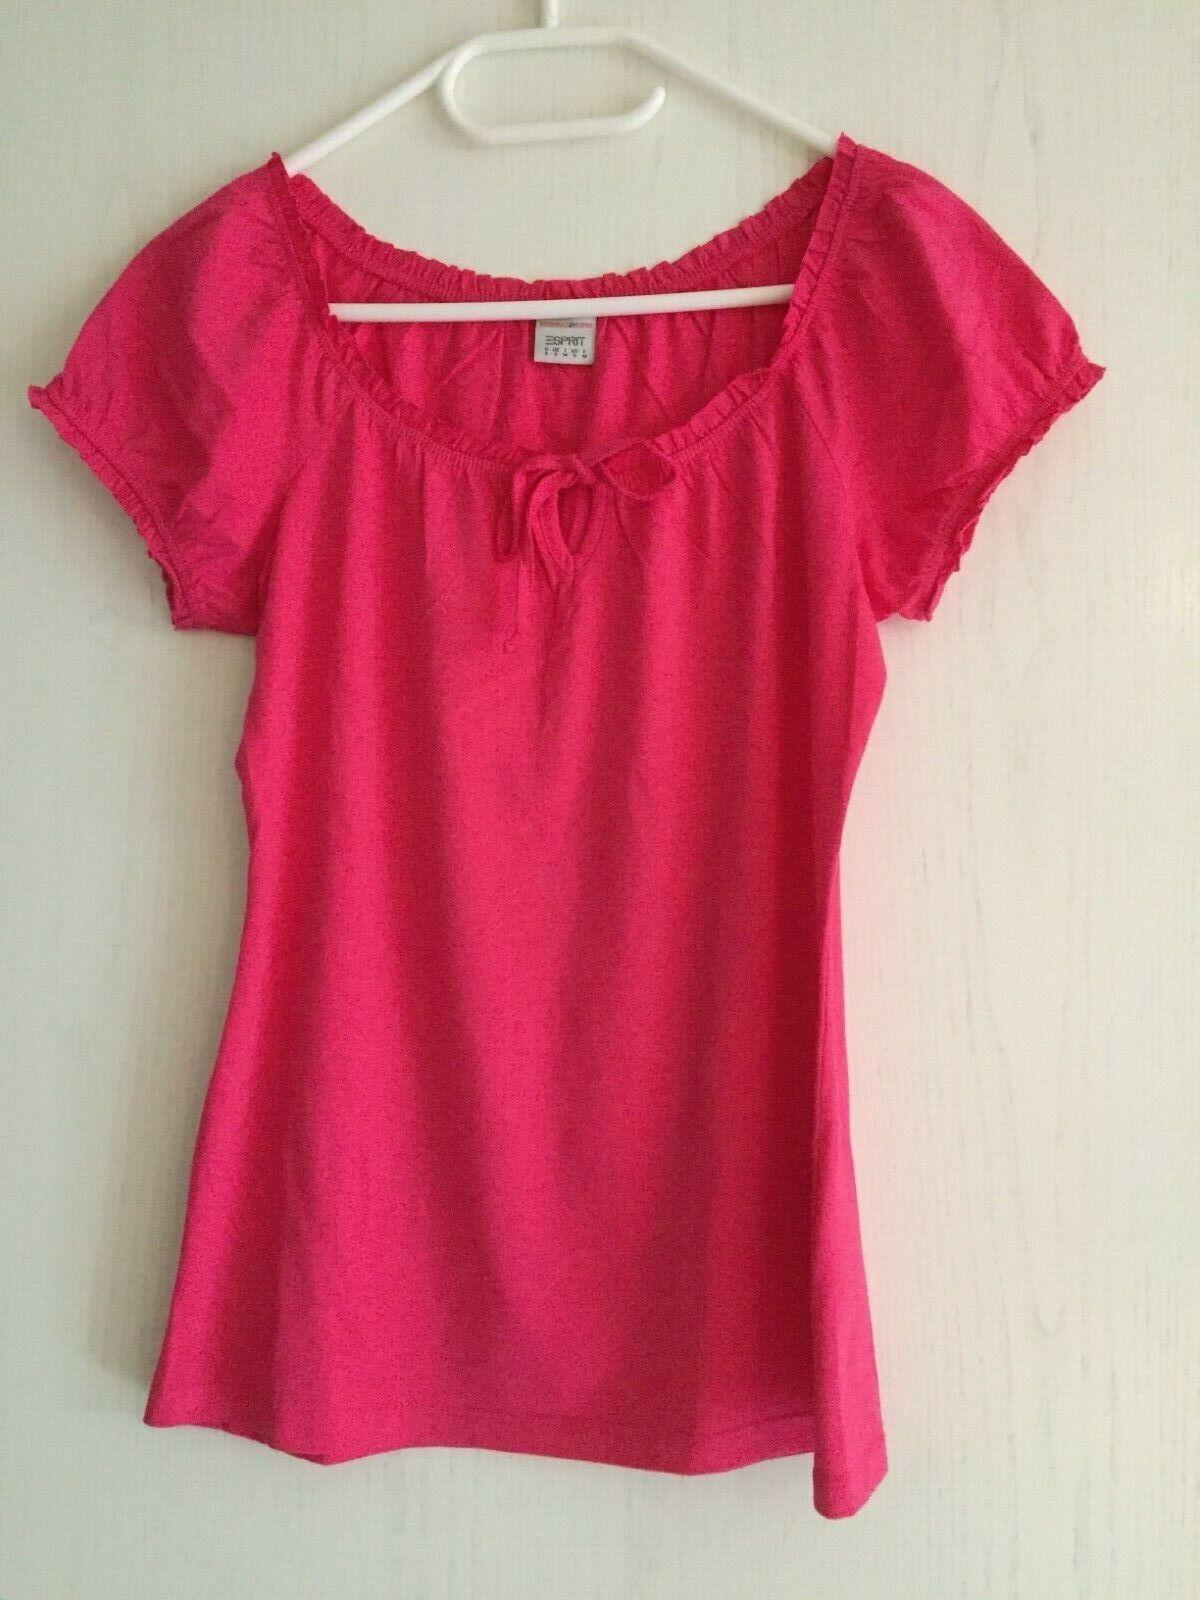 Esprit,  Damen Shirt, Bluse, Größe: S, Kurzarm, Pink - neuwertig